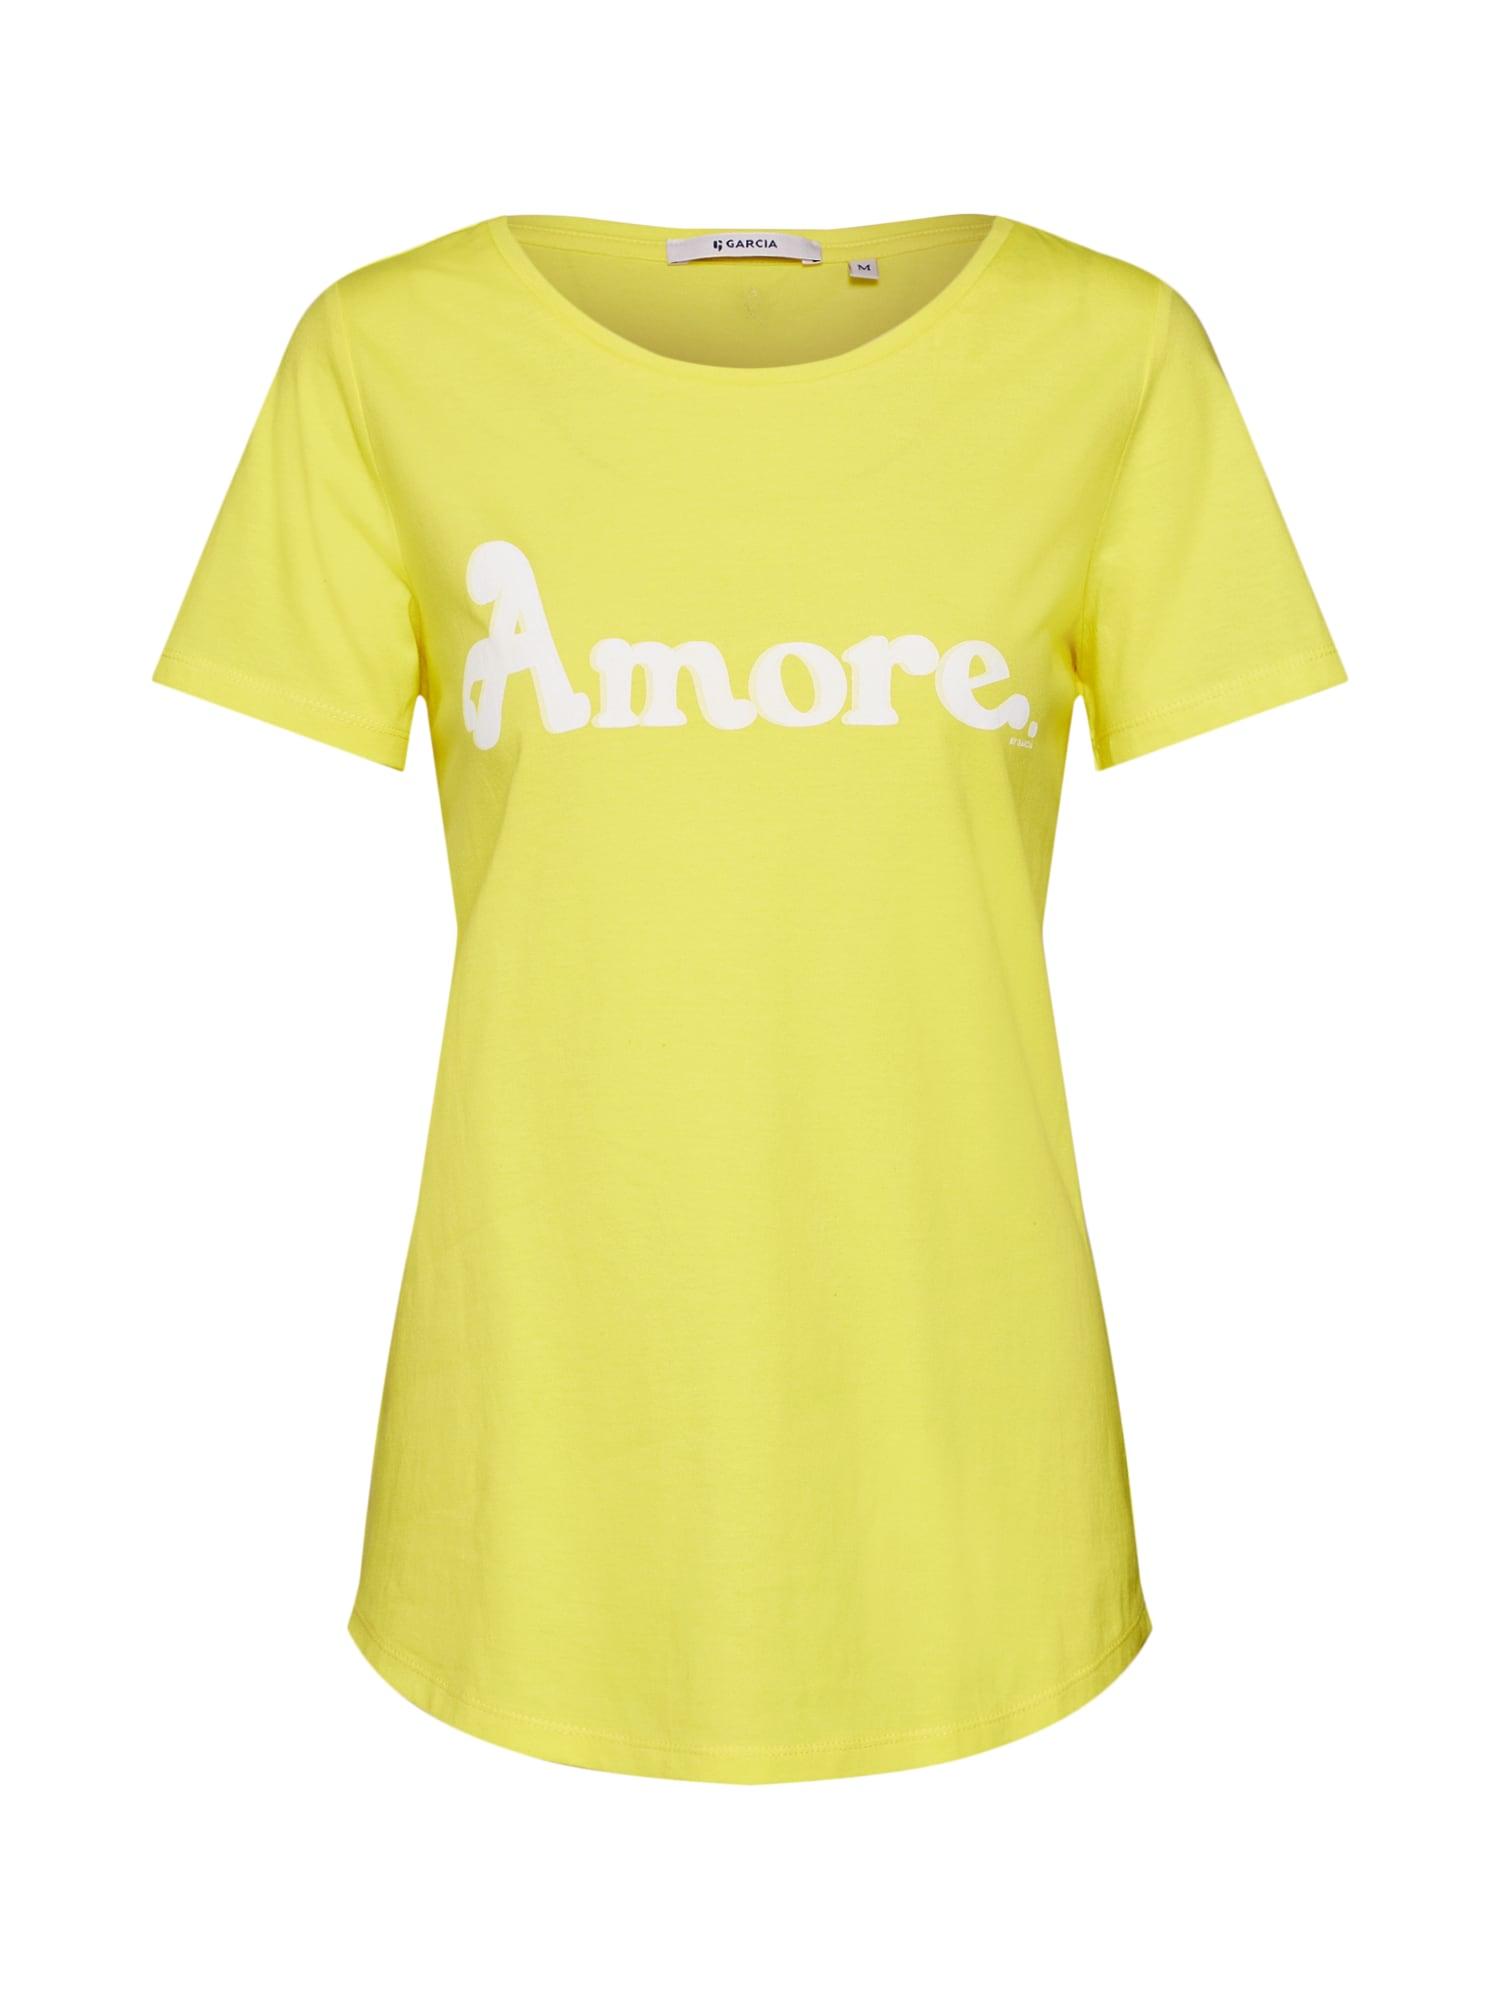 Tričko žlutá bílá GARCIA